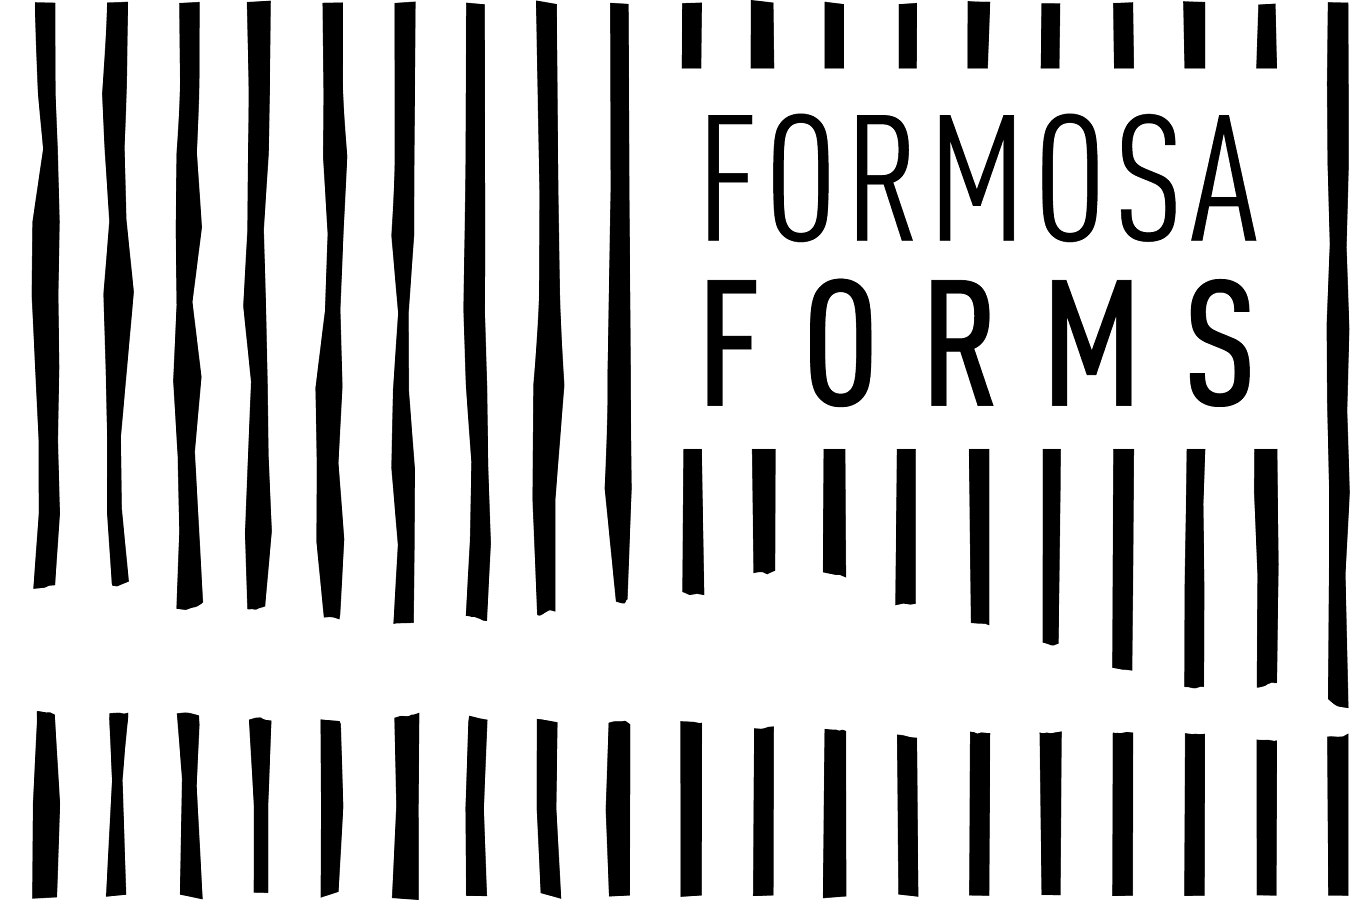 2019 Formosa Forms國際設計交流與參展廠商徵求中!